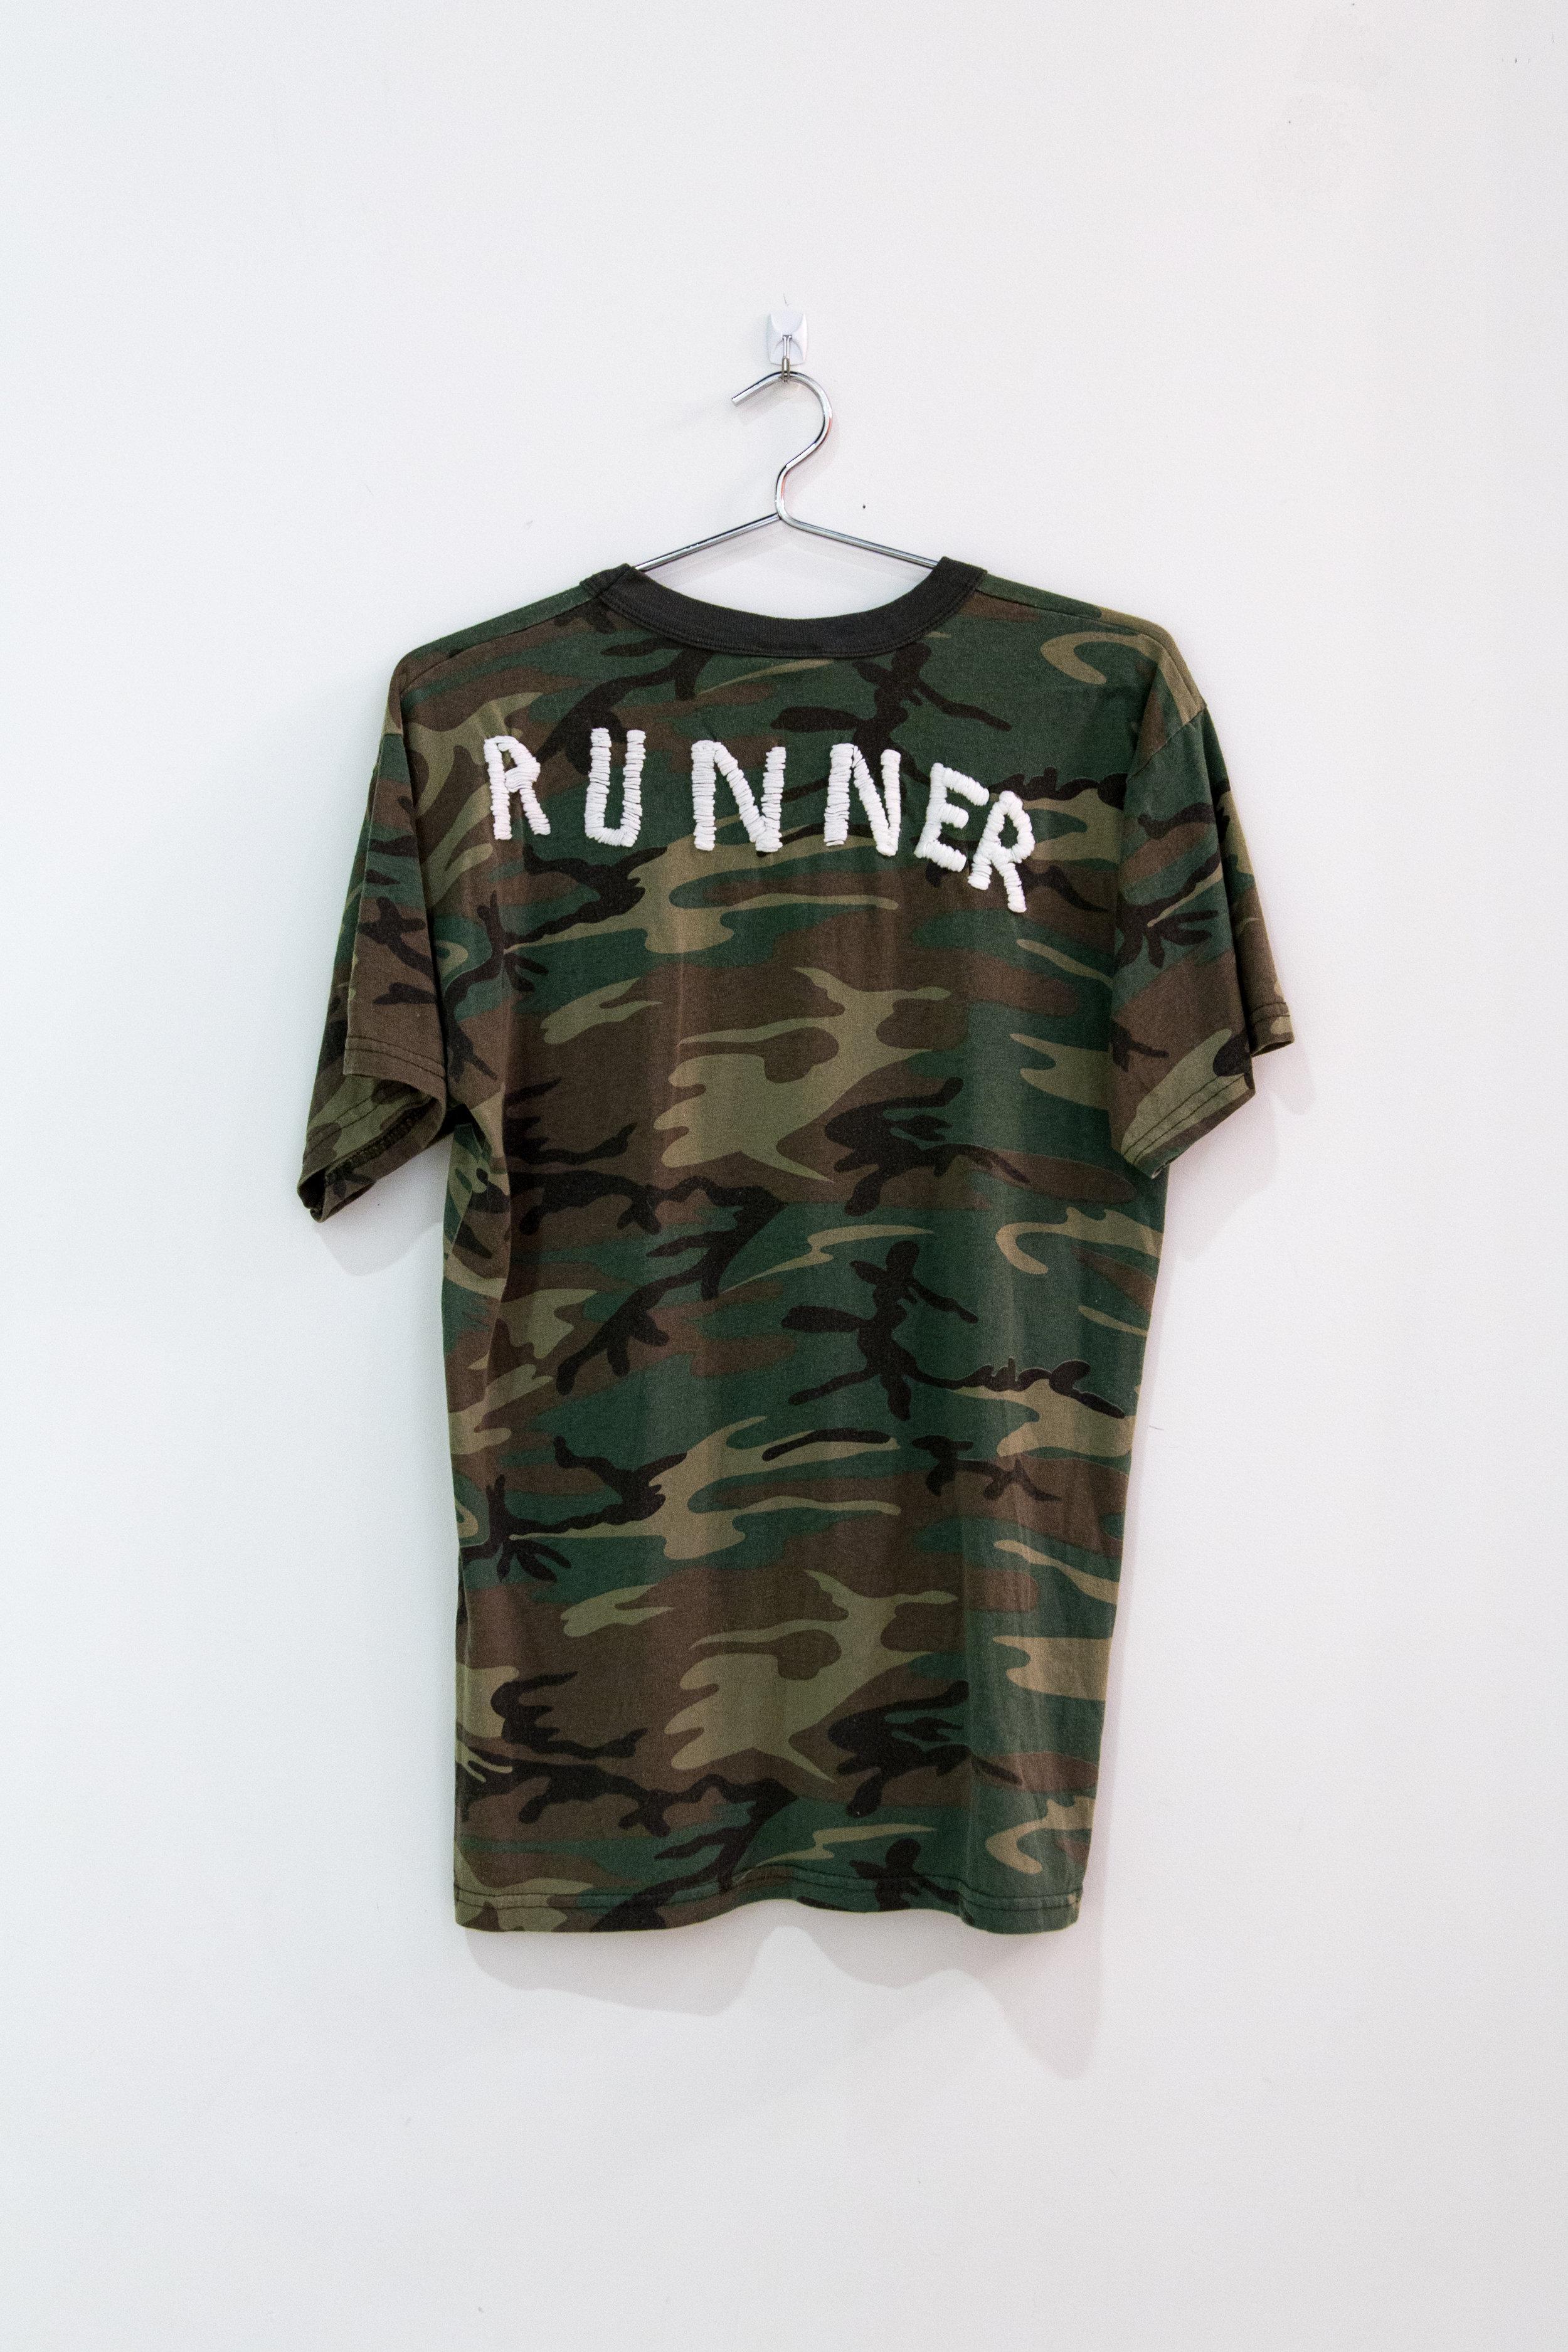 "Runner, 2017, embroidered t-shirt, 18"" x 24"""